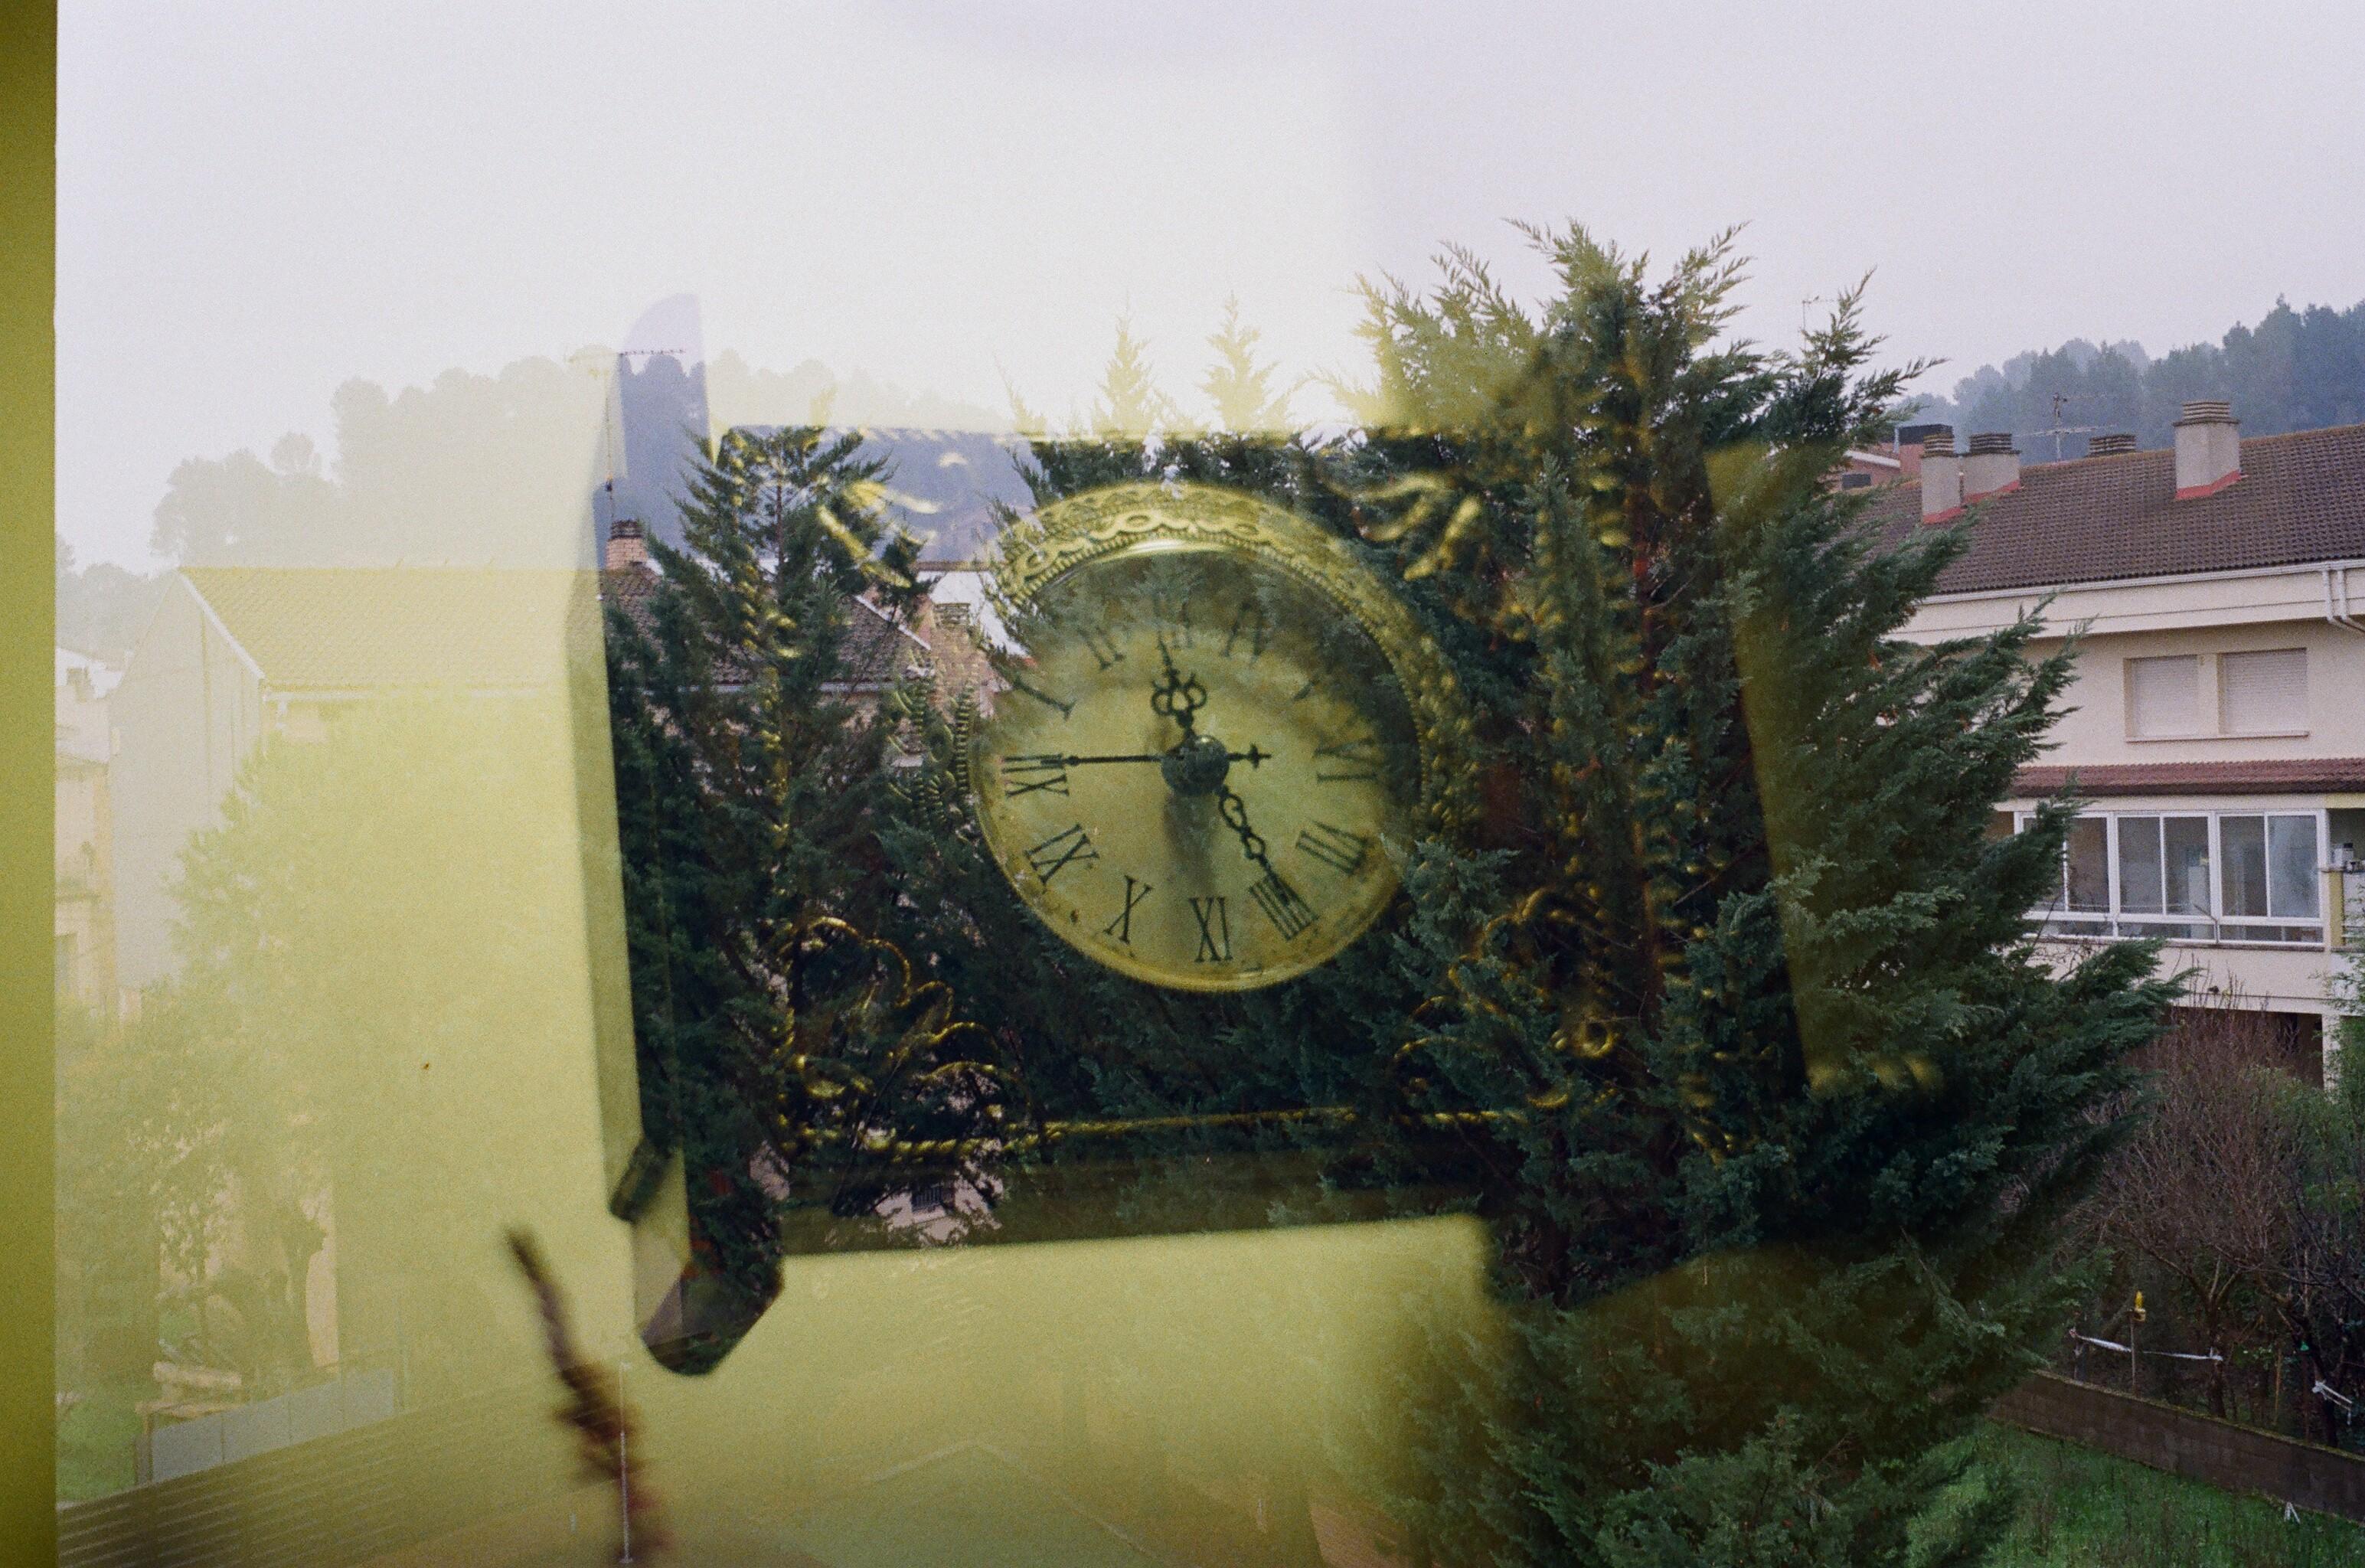 © Natàlia Muñoz - Time flows and blooms